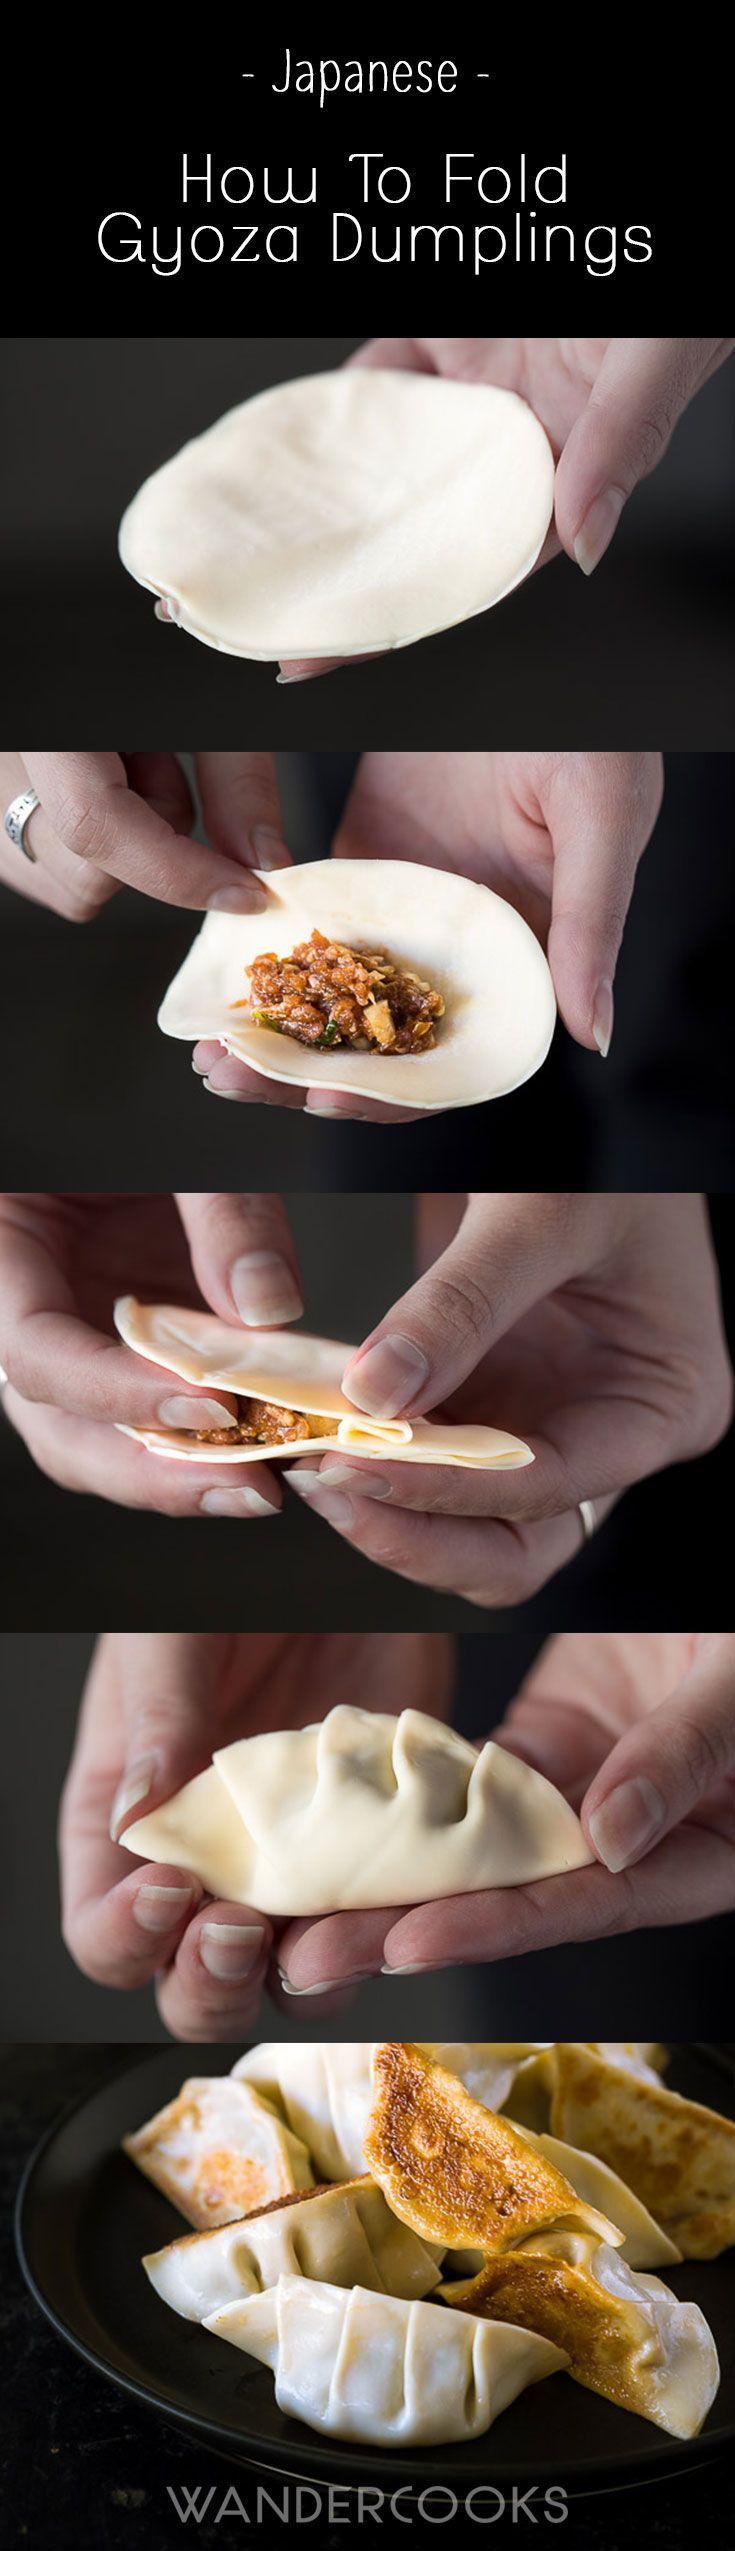 Gyoza (Japanese Pork Dumplings) - Learn how to fold simple gyoza dumplings with this easy 4-step how to.   http://wandercooks.com